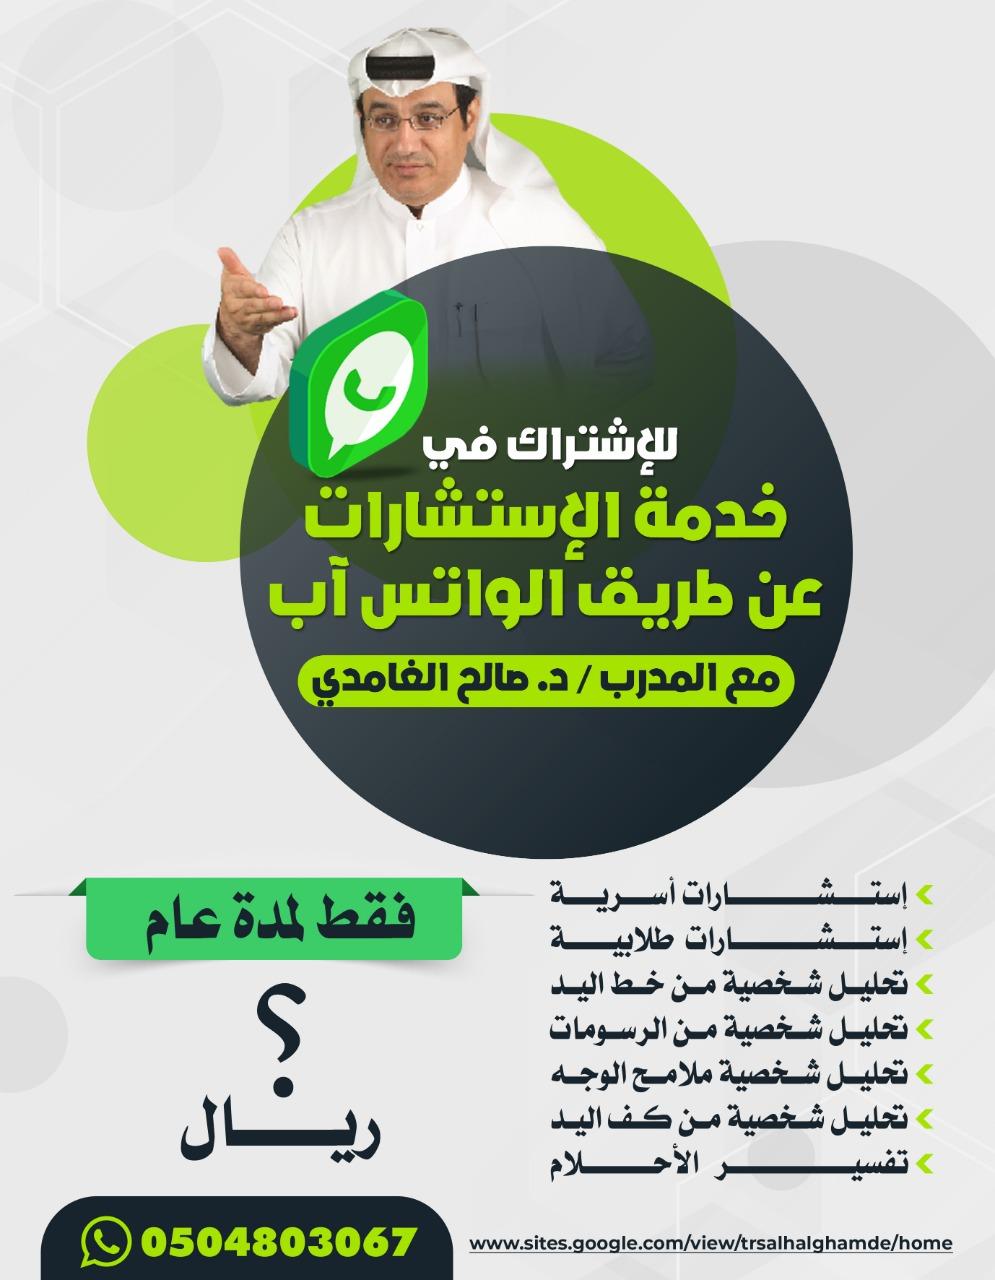 منتدى المدرب / صالح غرم الله  الغامدي Whatsa26